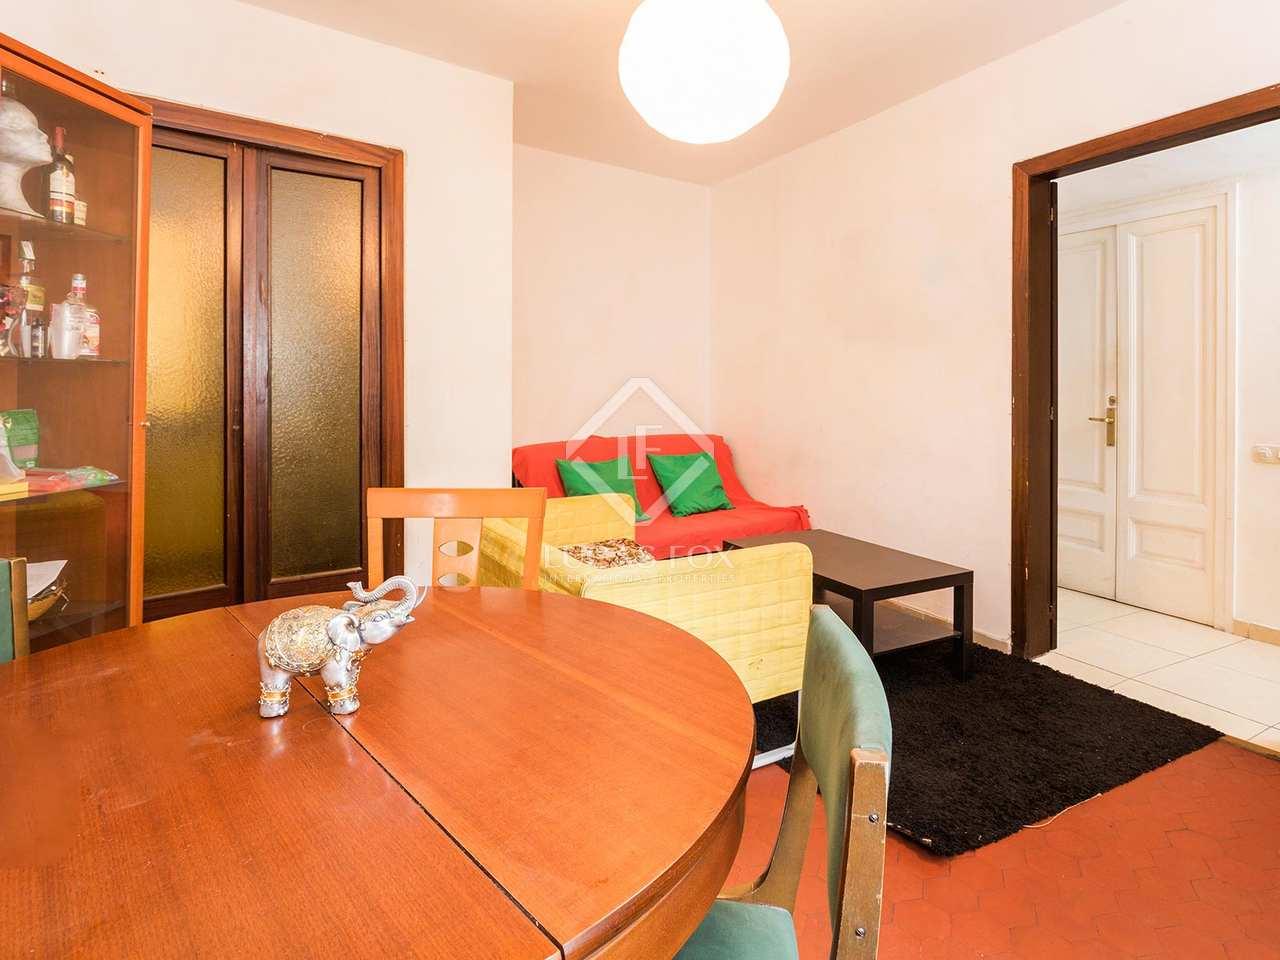 Appartement de 94m a vendre g tico barcelone - Acheter appartement a barcelone ...